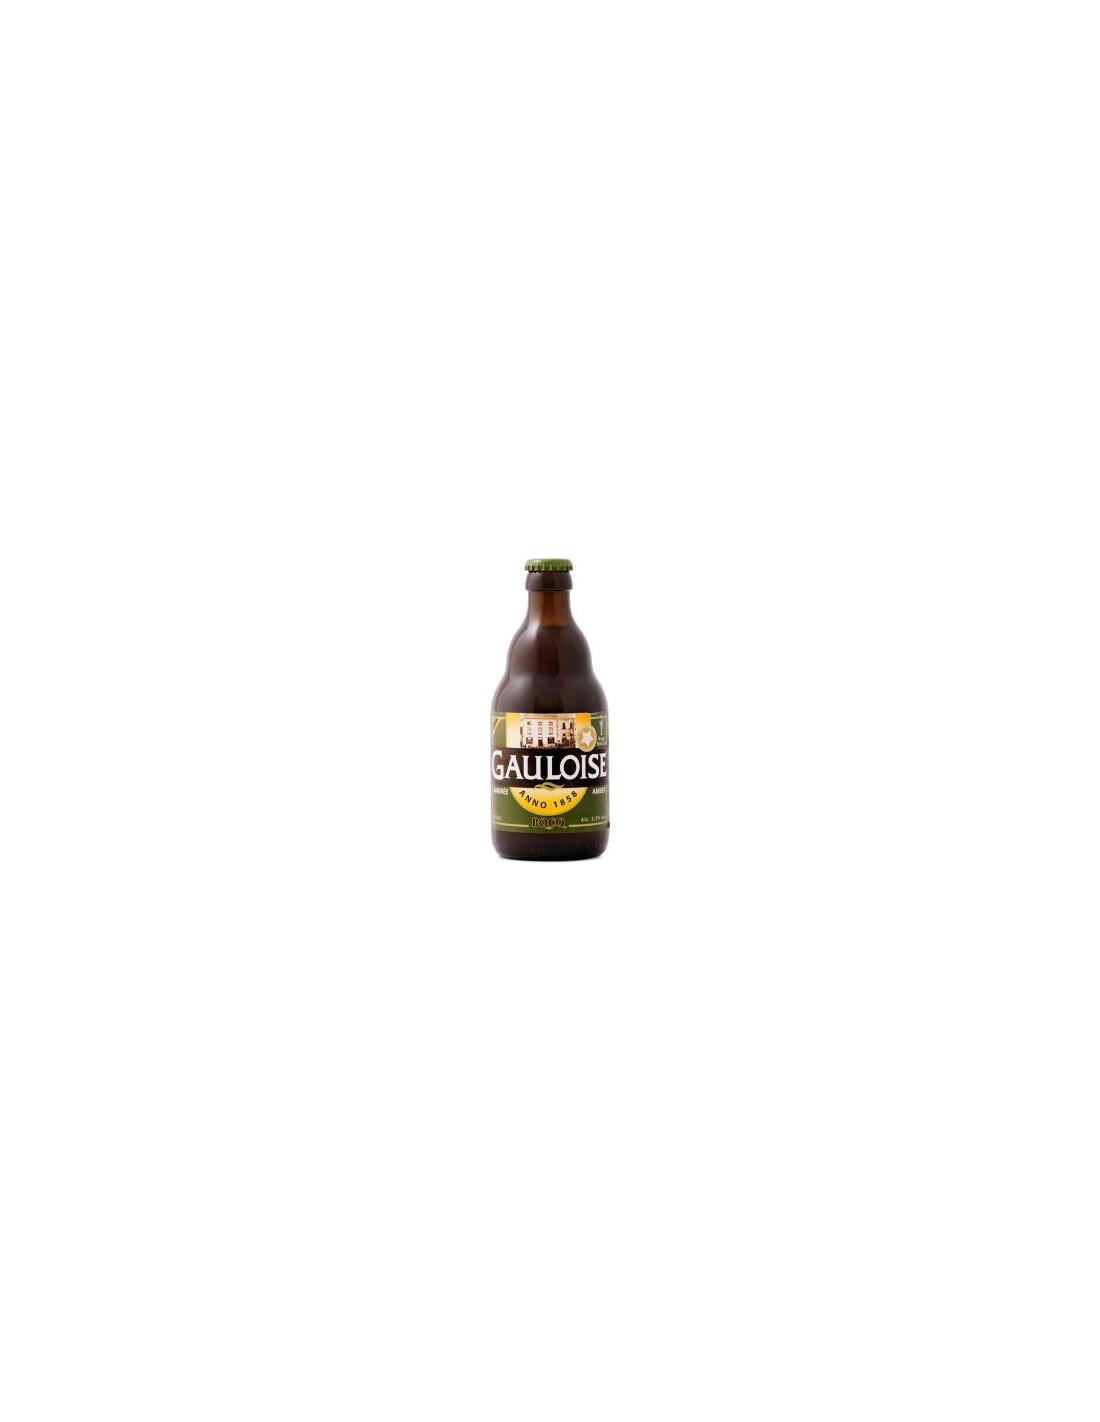 Bere amber Gauloise, 8.1% alc., 0.33L, Belgia